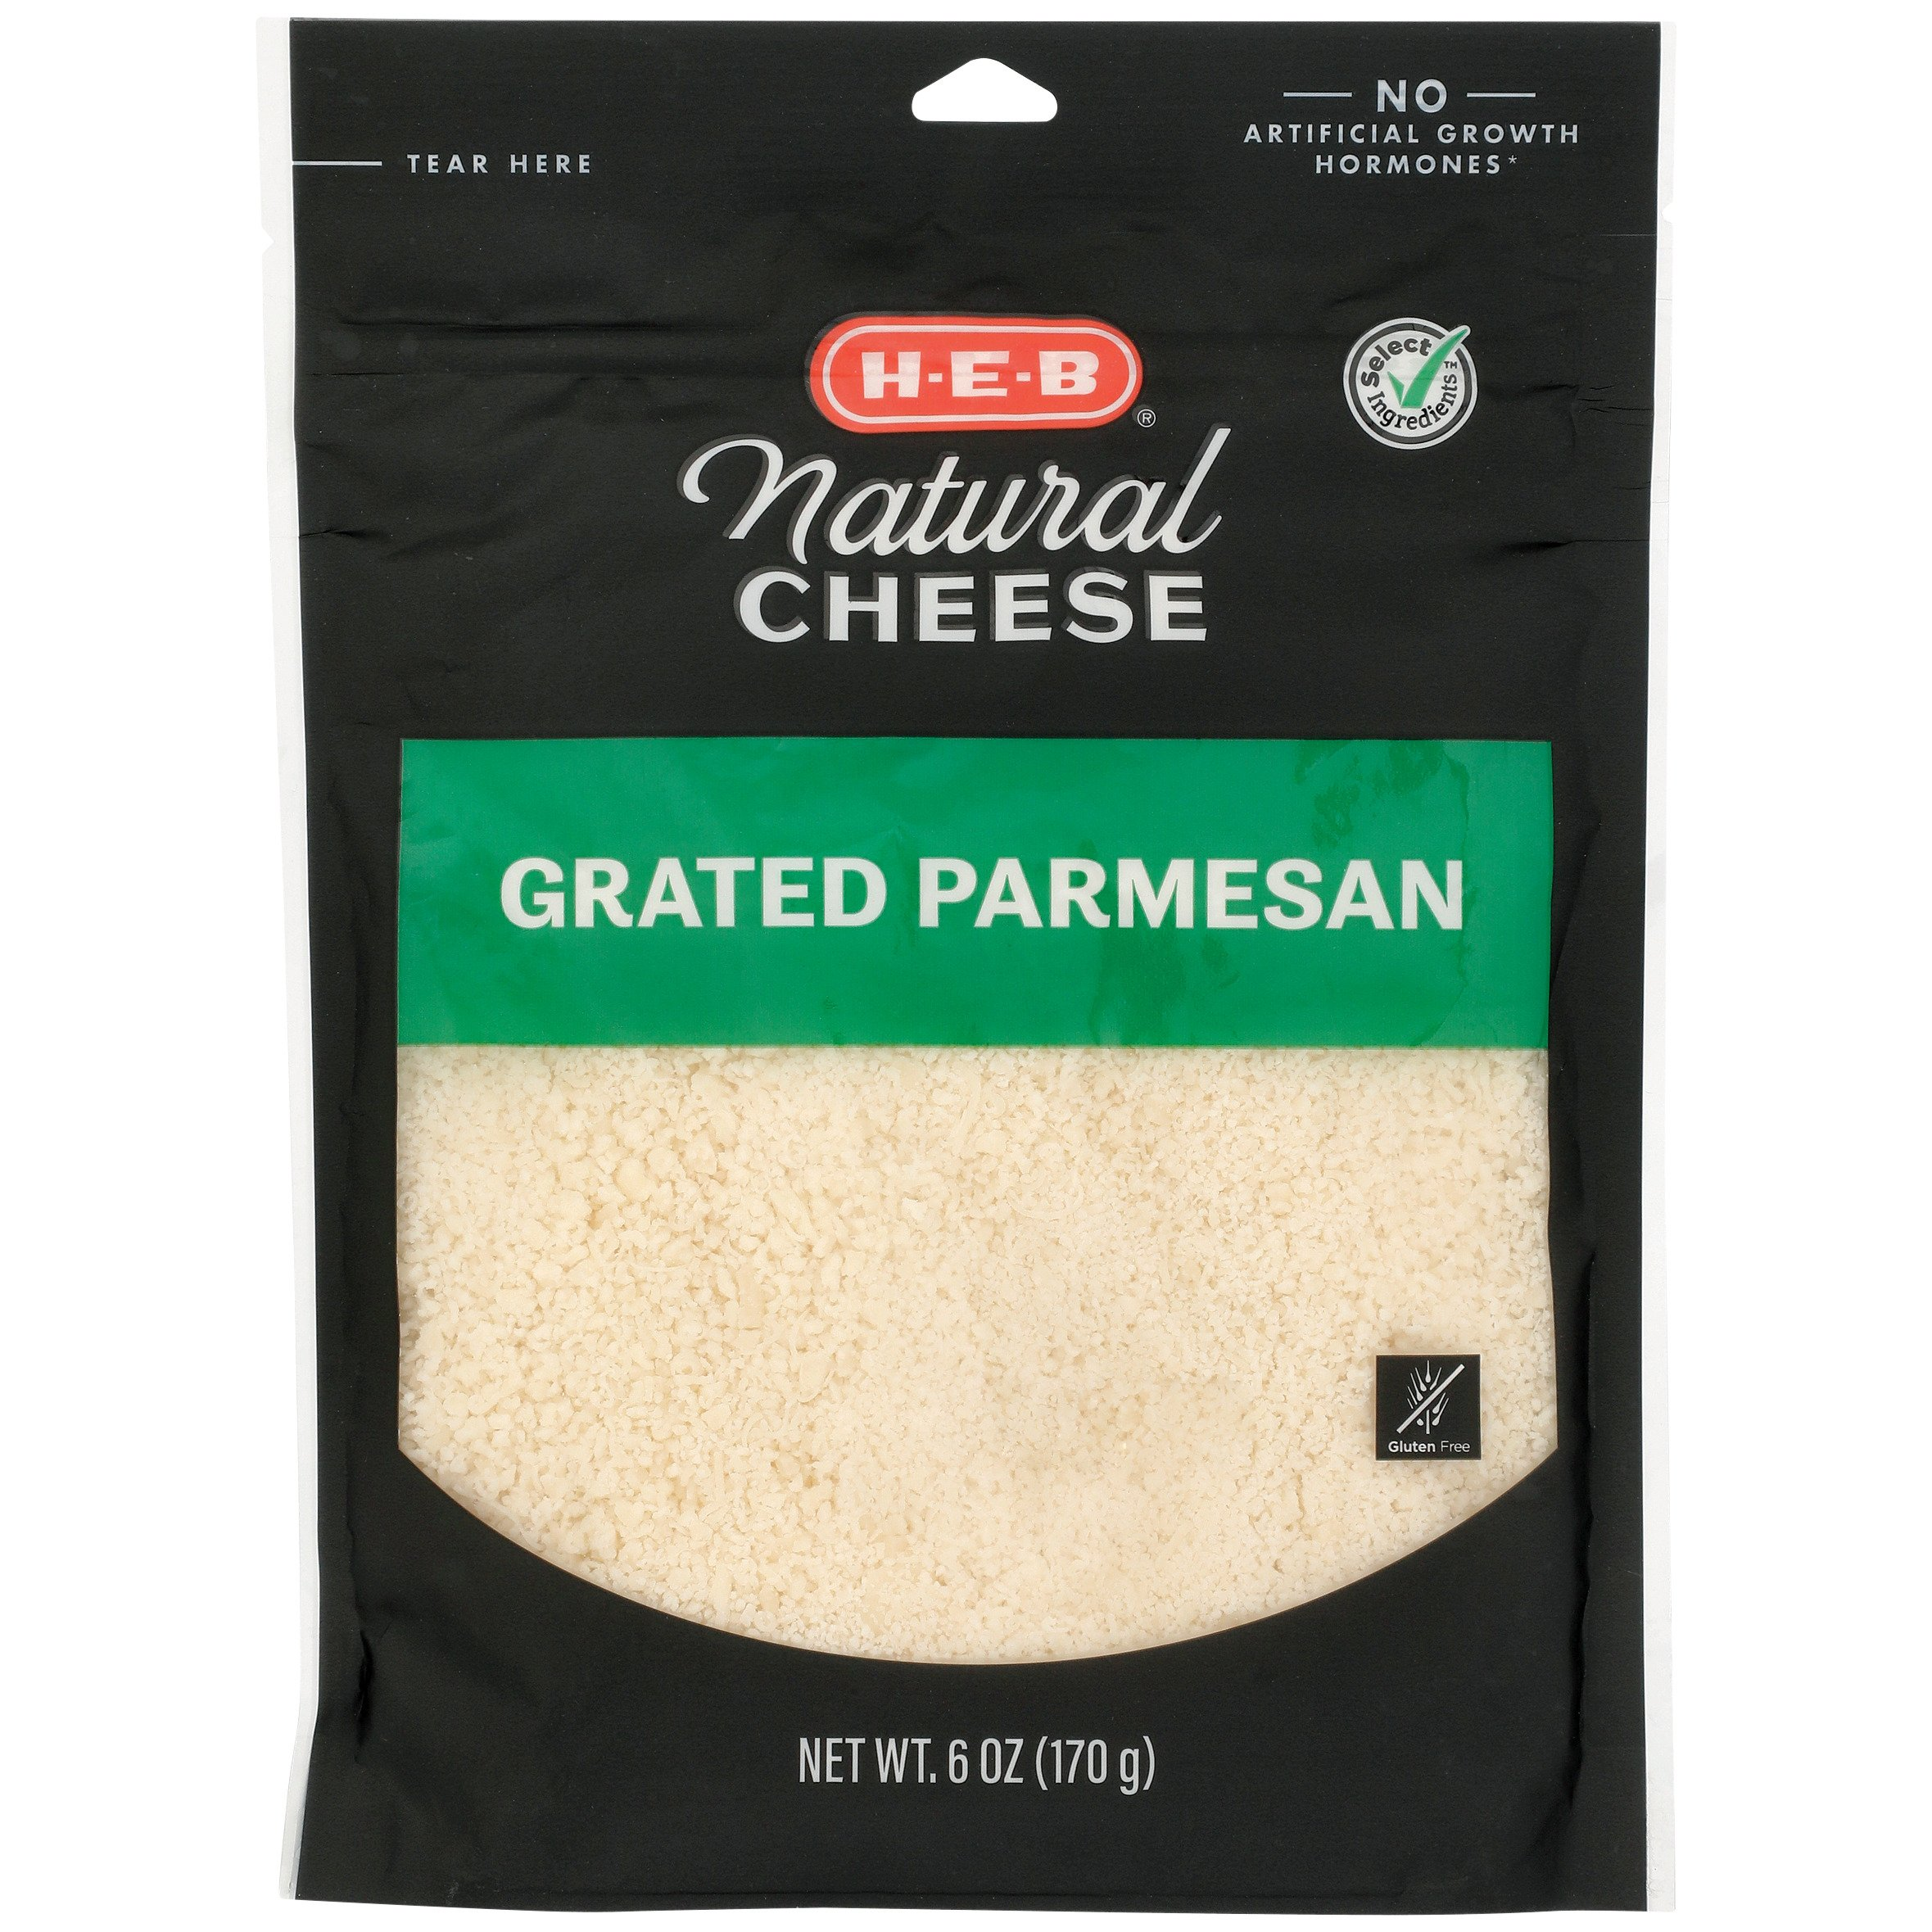 H E B Select Ingredients Parmesan Fresh Grated Cheese Shop Cheese At H E B,Gaillardia Varieties